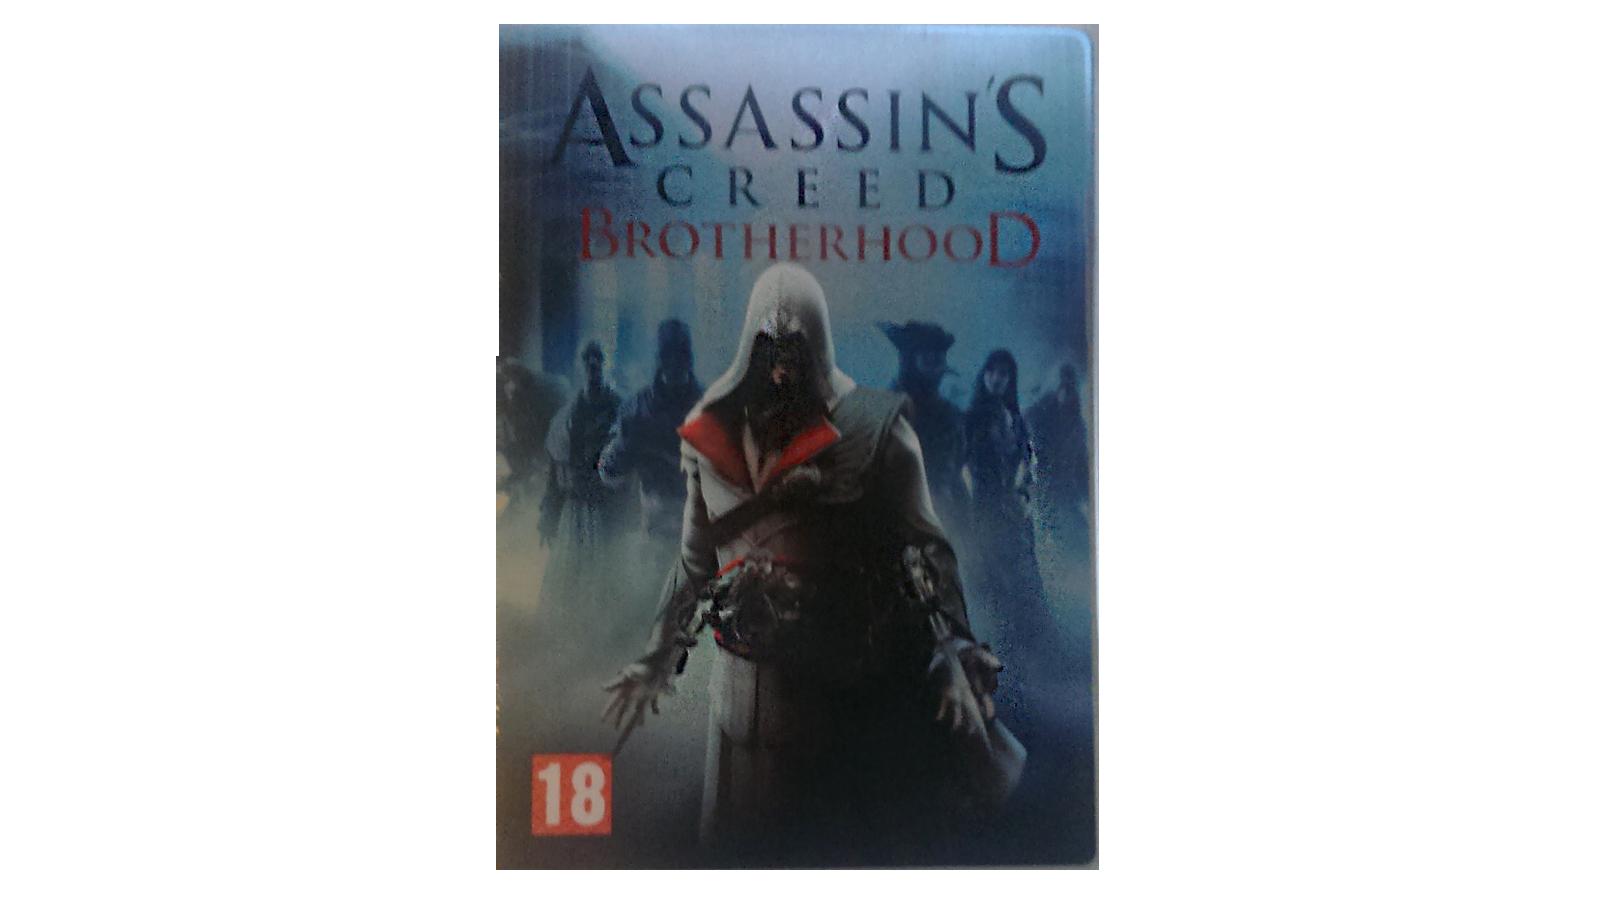 Assassin's Creed Brotherhood Steelbook